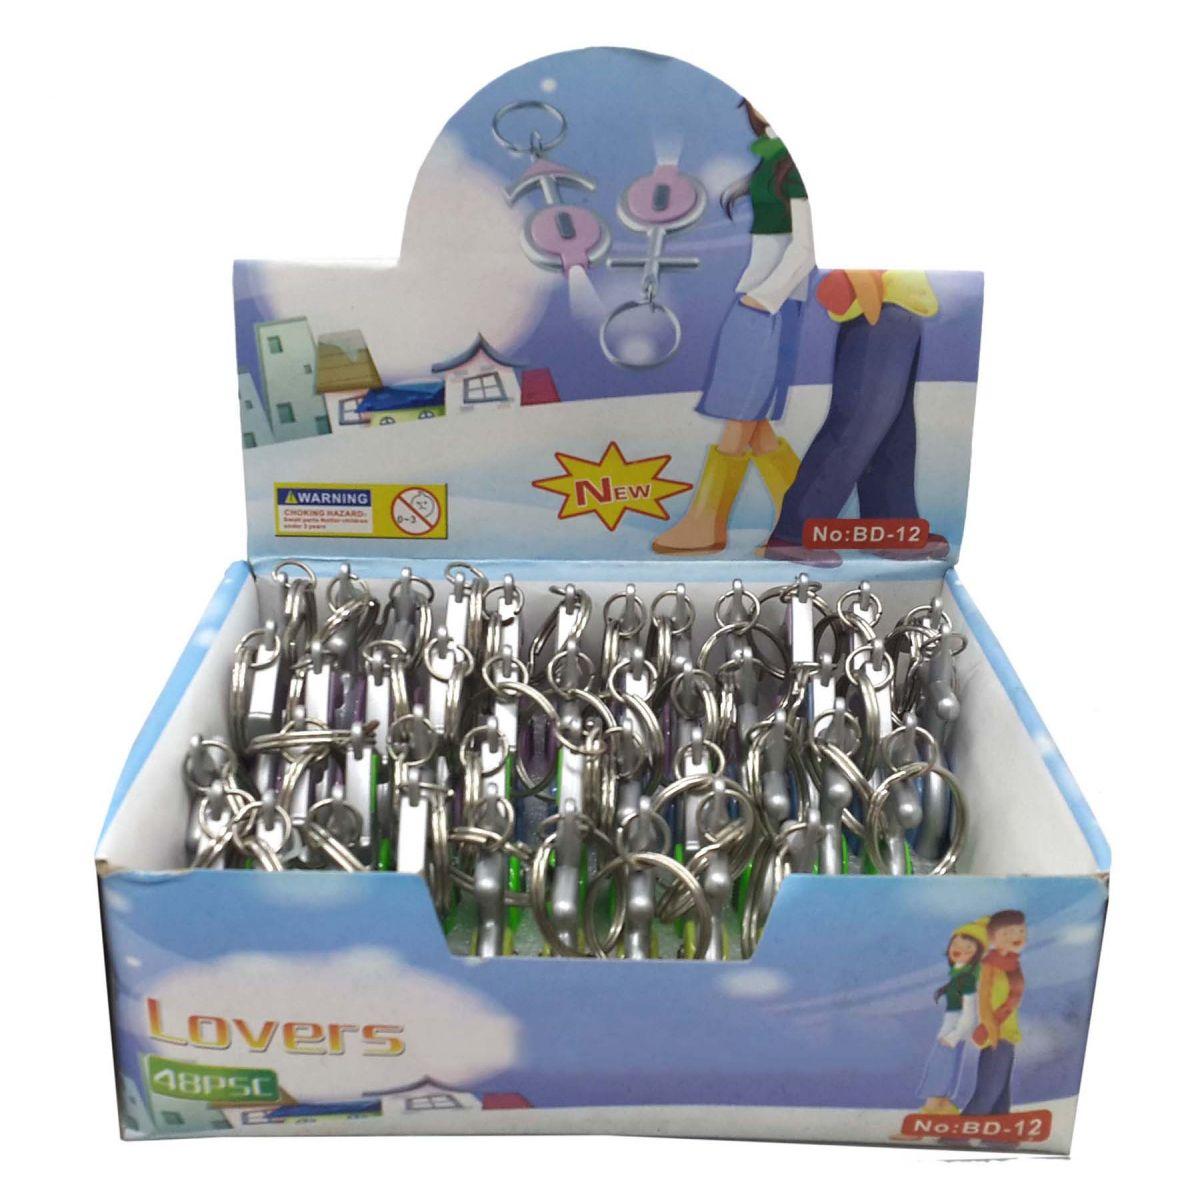 Chaveiro Lovers Prenda Brinde Cores Sortidas Box Com 48 Unid (BL-1503-16)